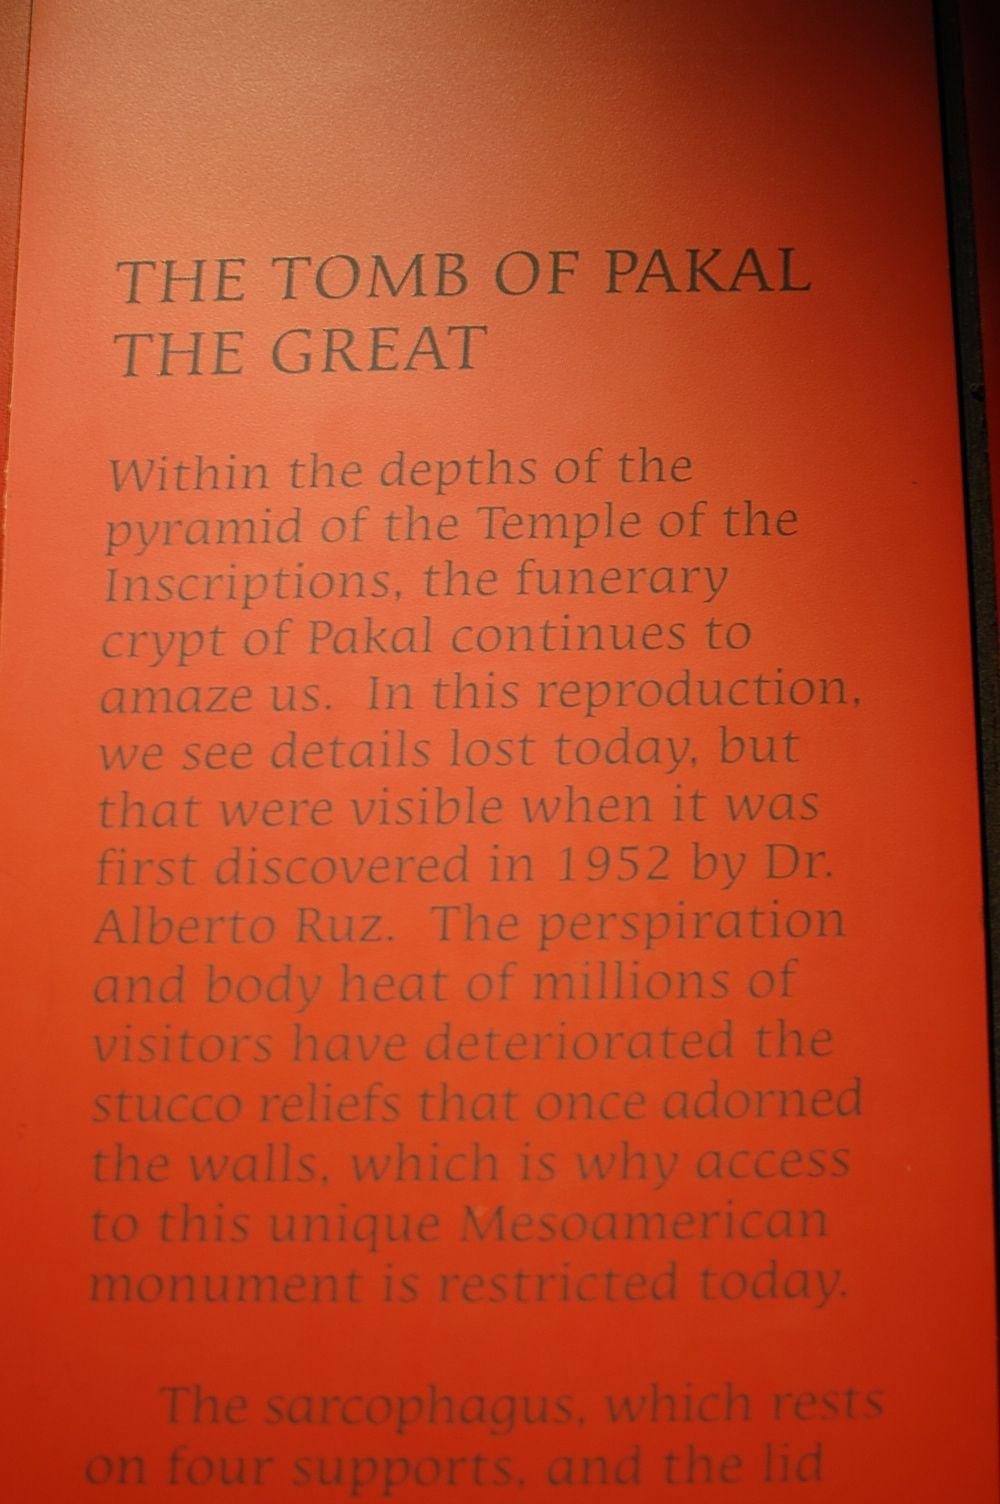 Tomb of Pakal Graphic